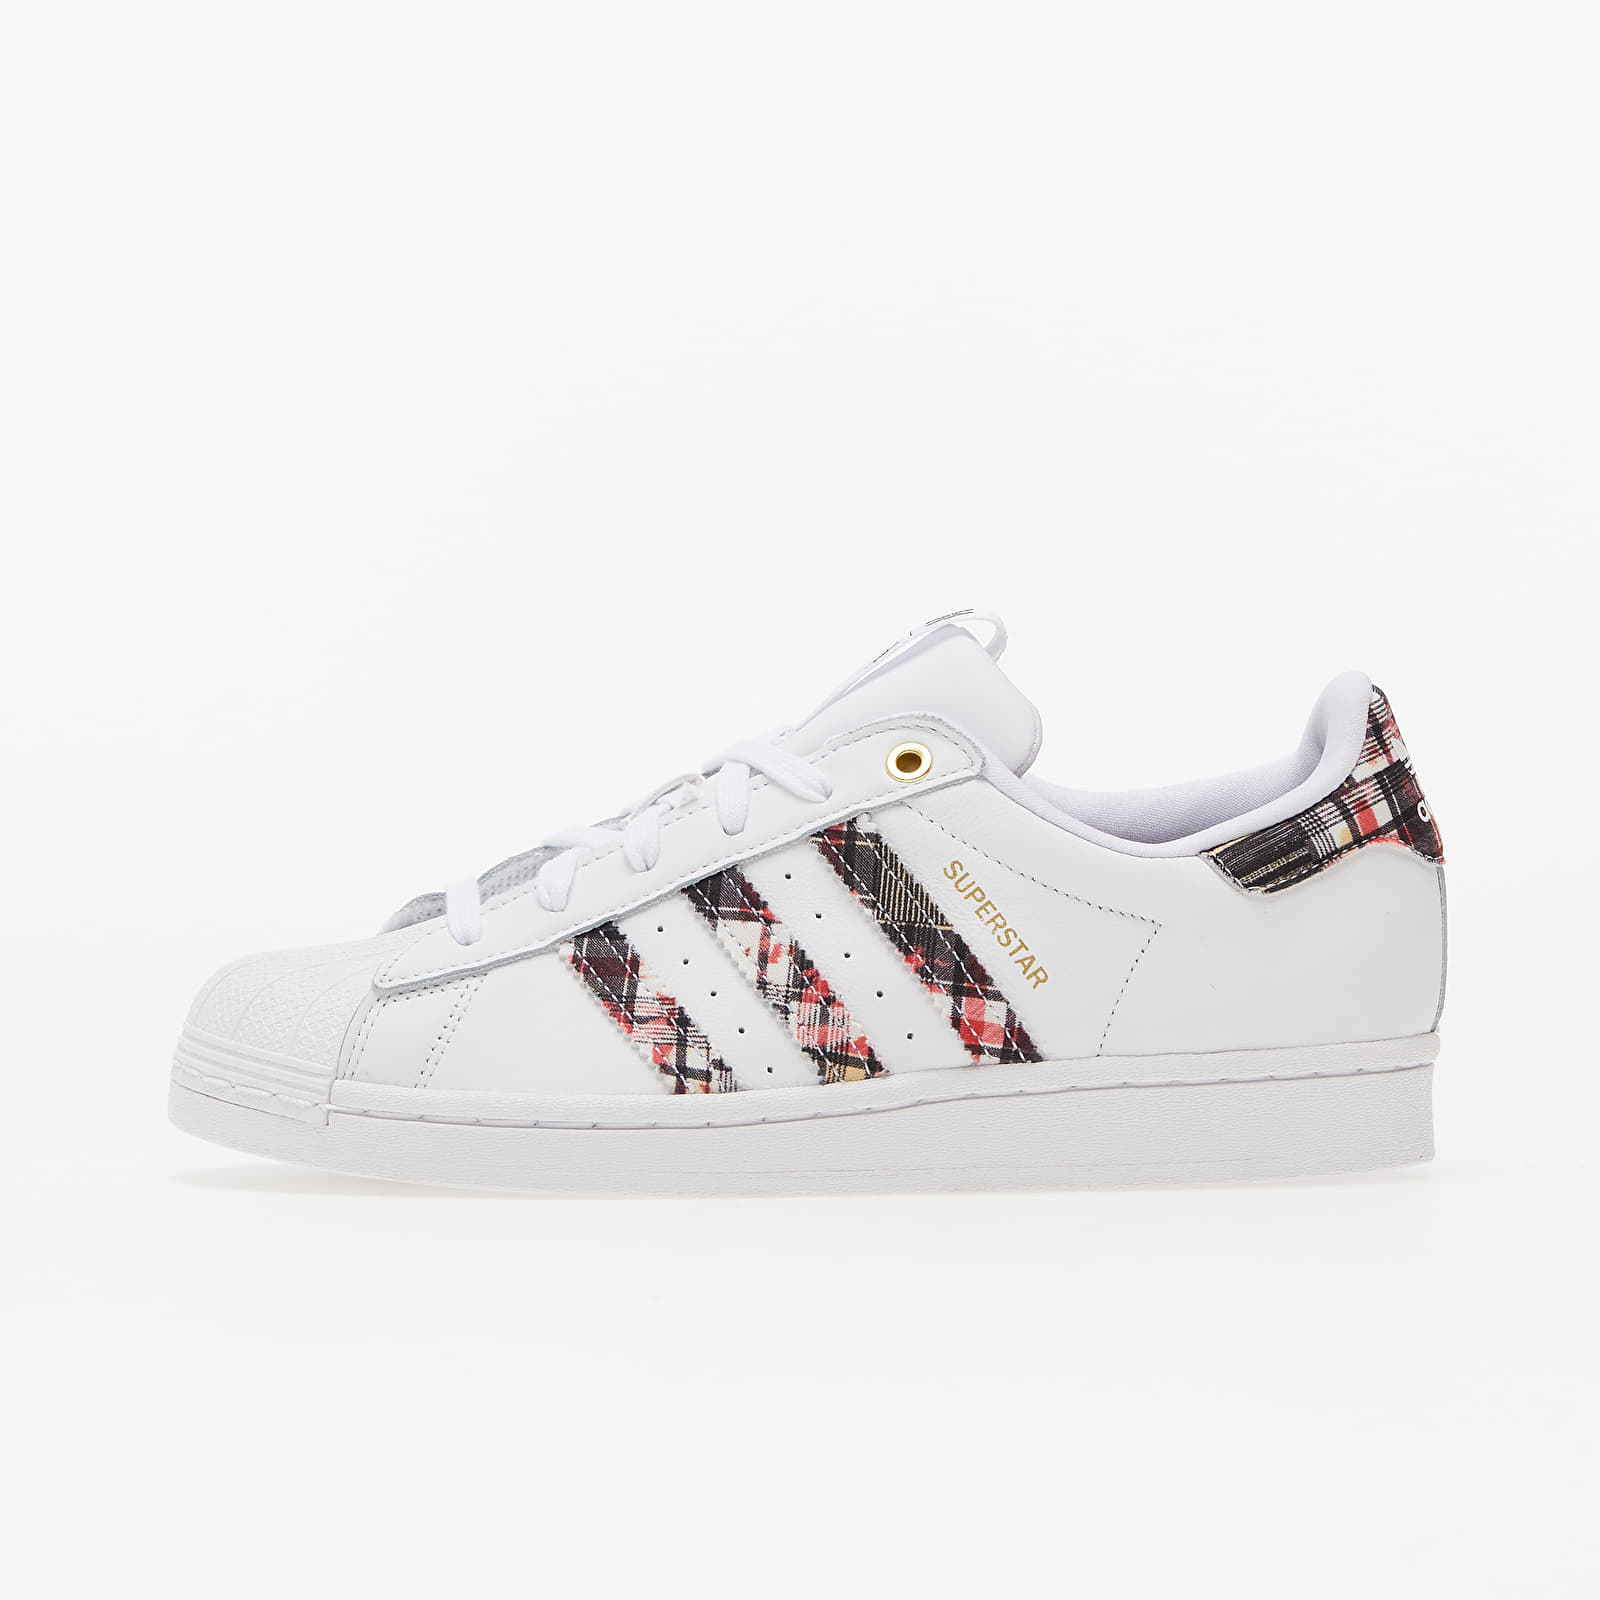 adidas HER Studio London Superstar W Ftw White/ Supplier Colour/ Mate Gold EUR 41 1/3